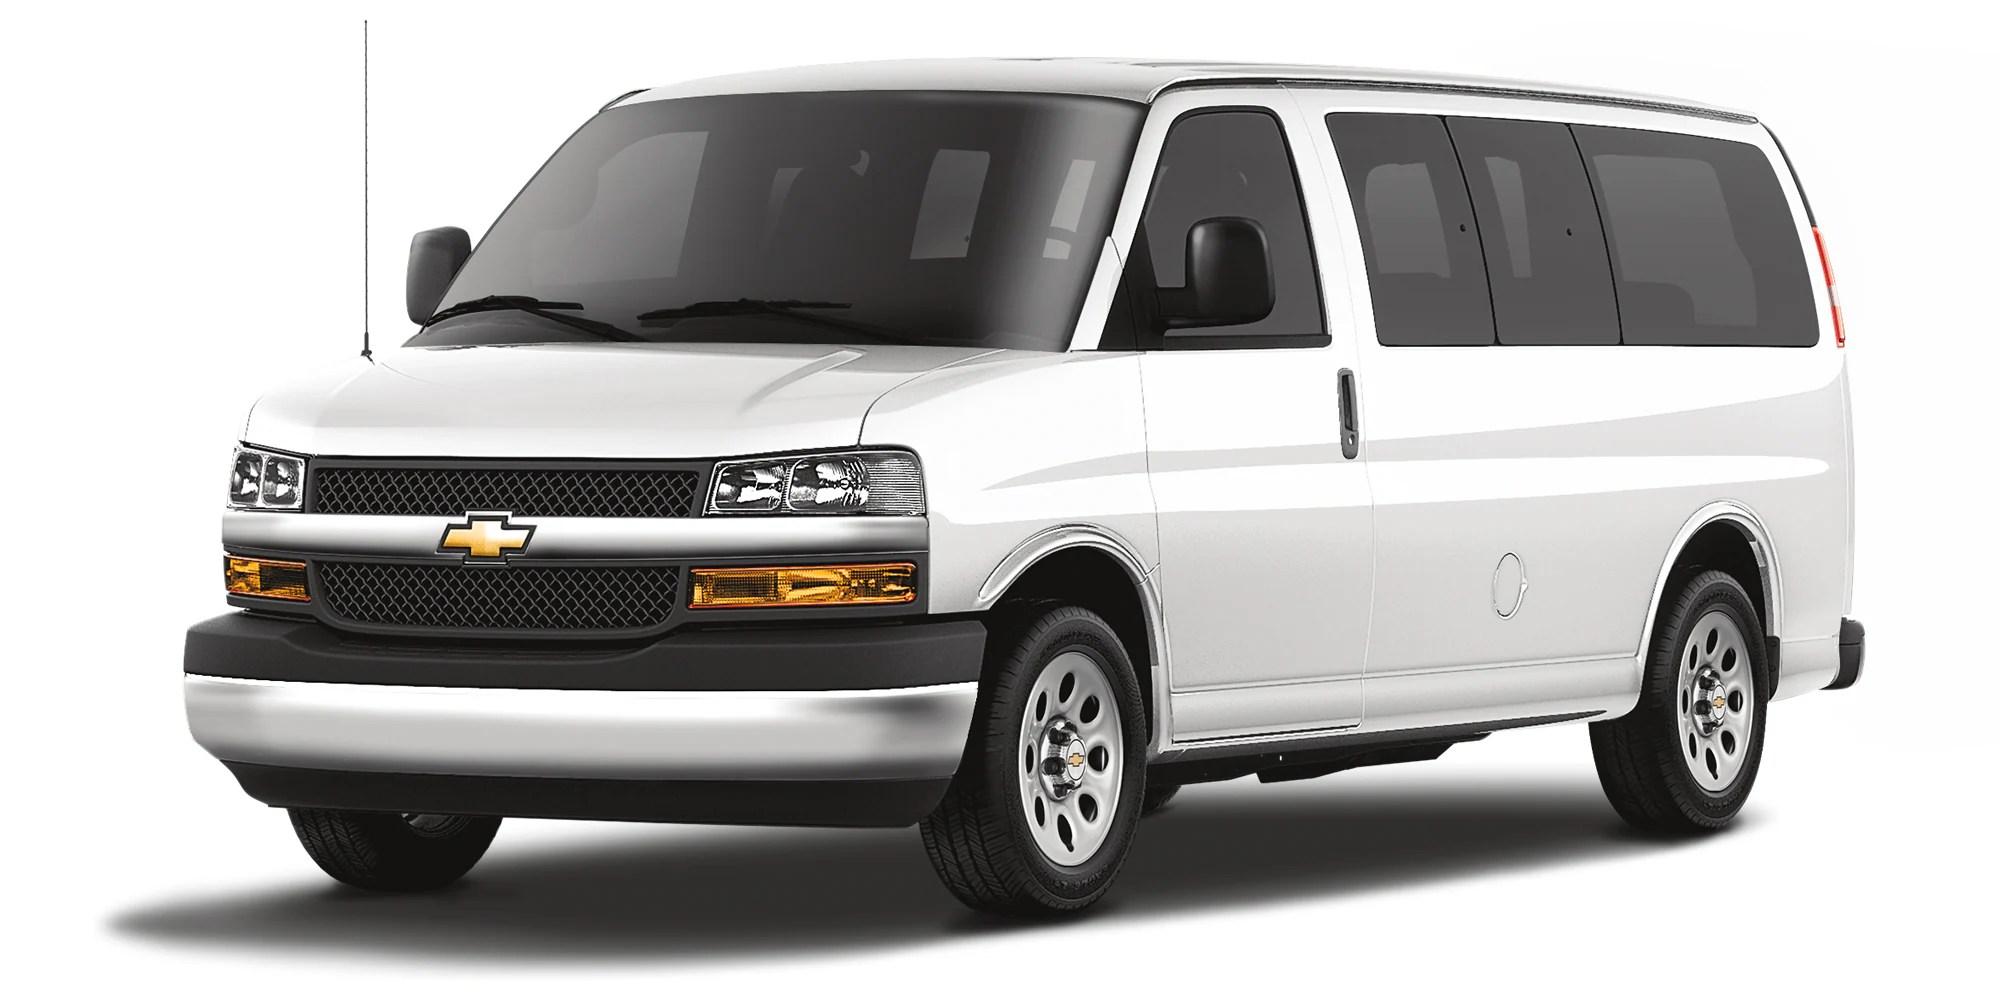 medium resolution of express 2019 camioneta van color blanco